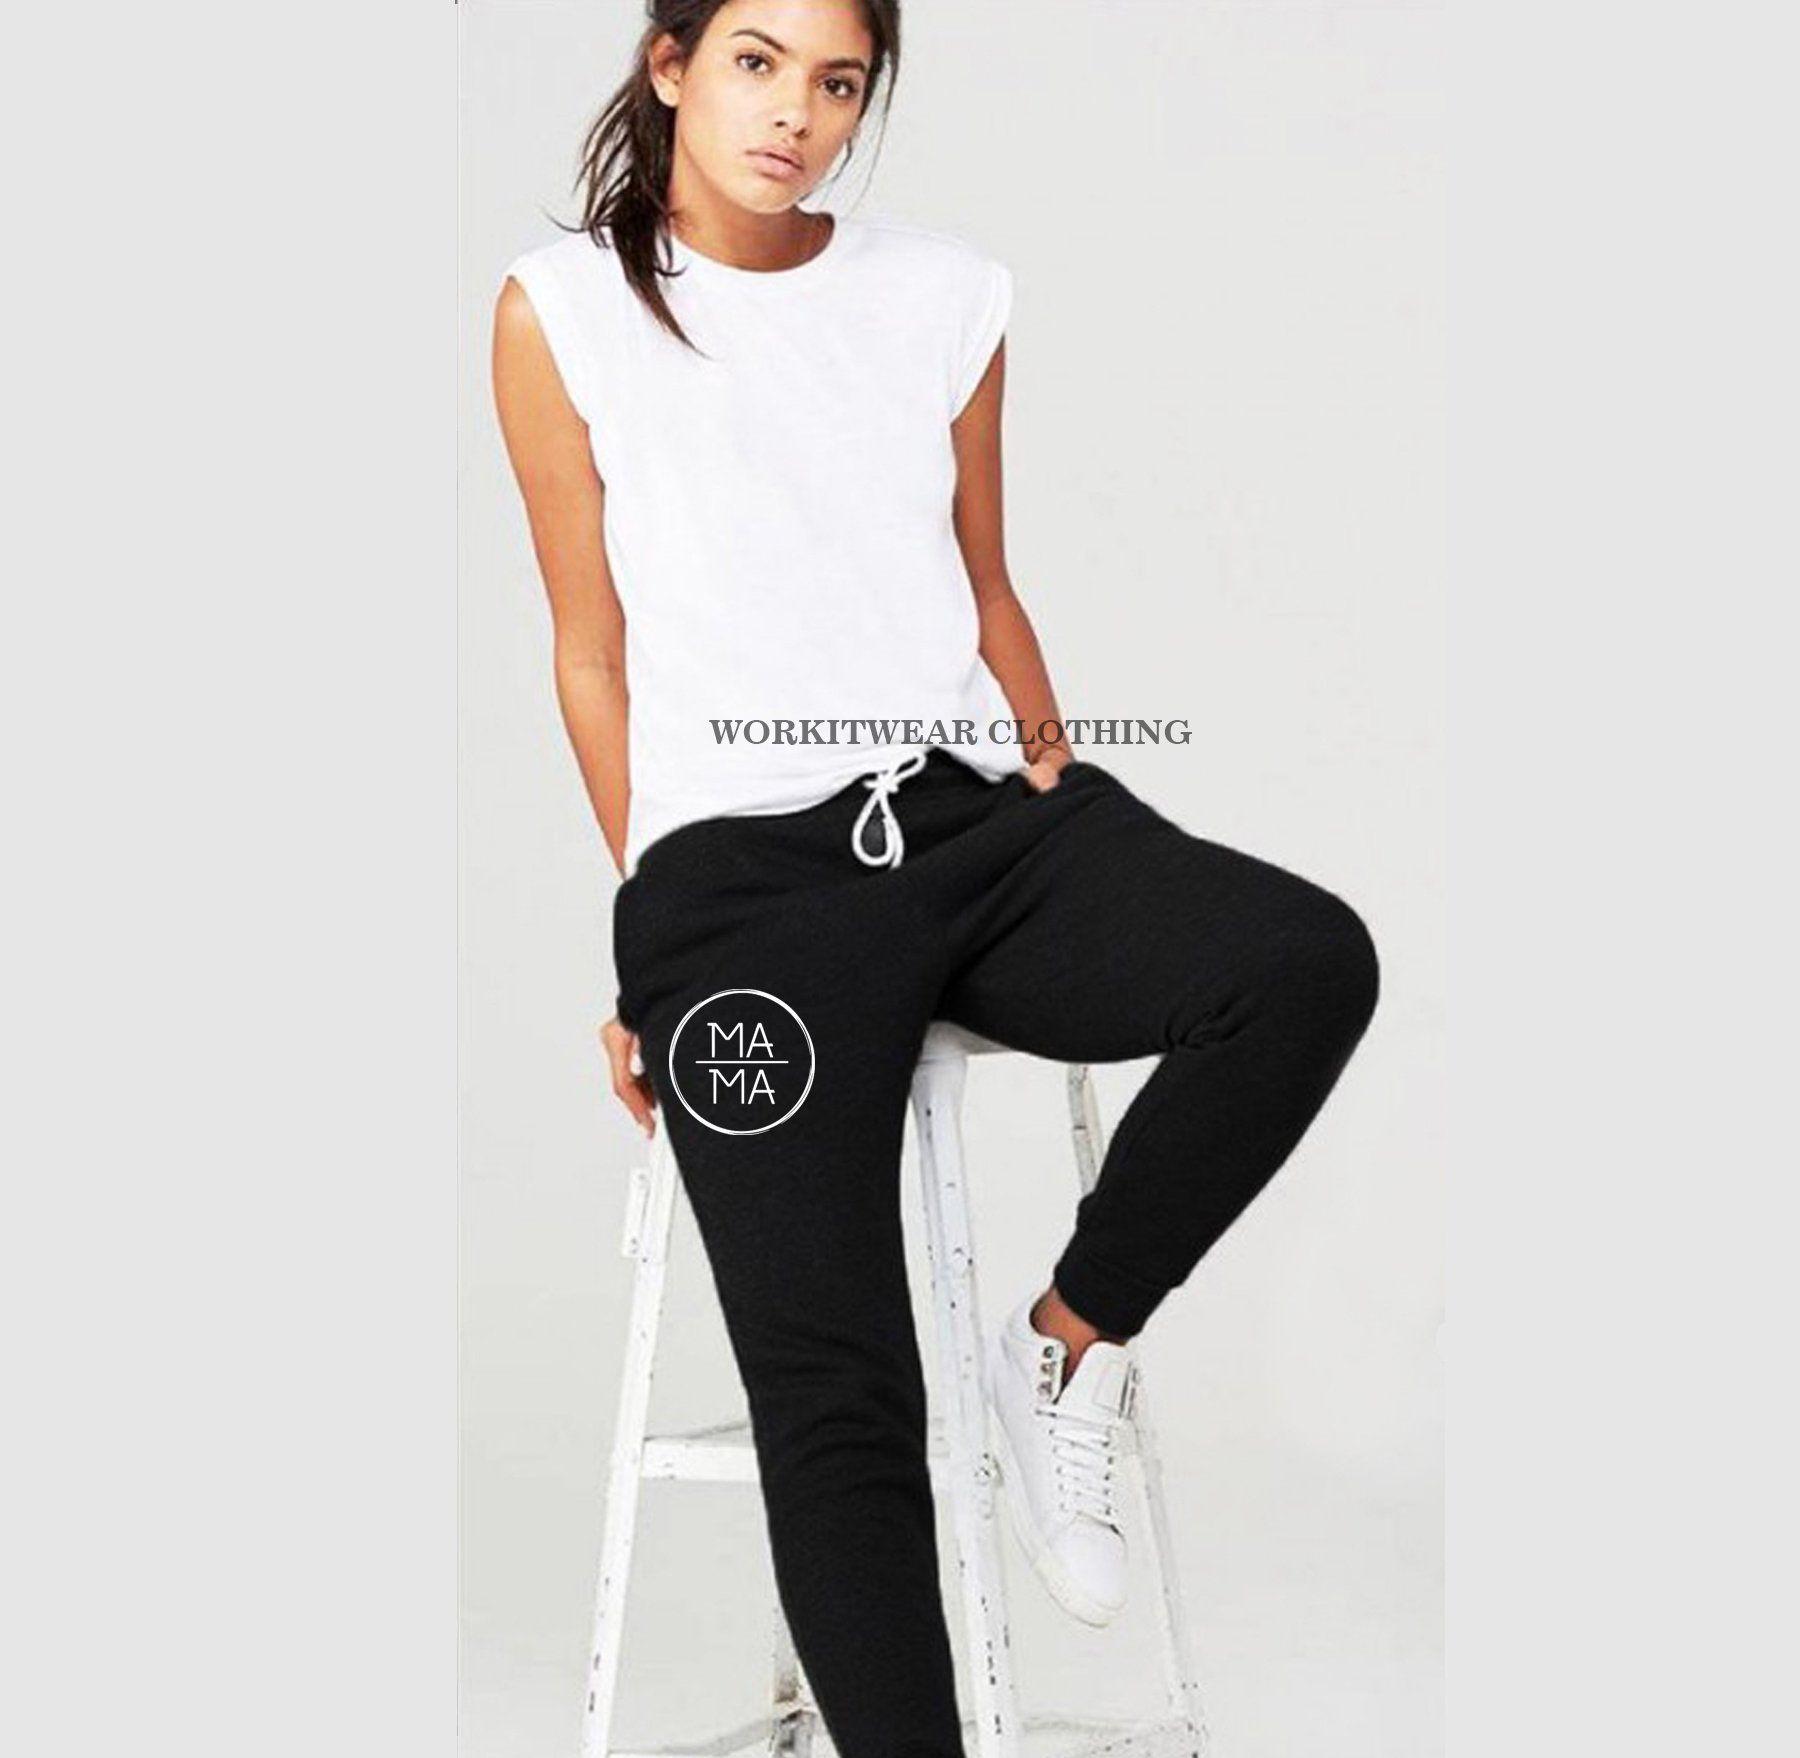 MAMA Joggers. Loungewear. Mama Sweatpants. Cute Joggers. Mom Apparel. Mom Life. Mom Sweatpants. Gift for Mom. Mom Apparel. COZY